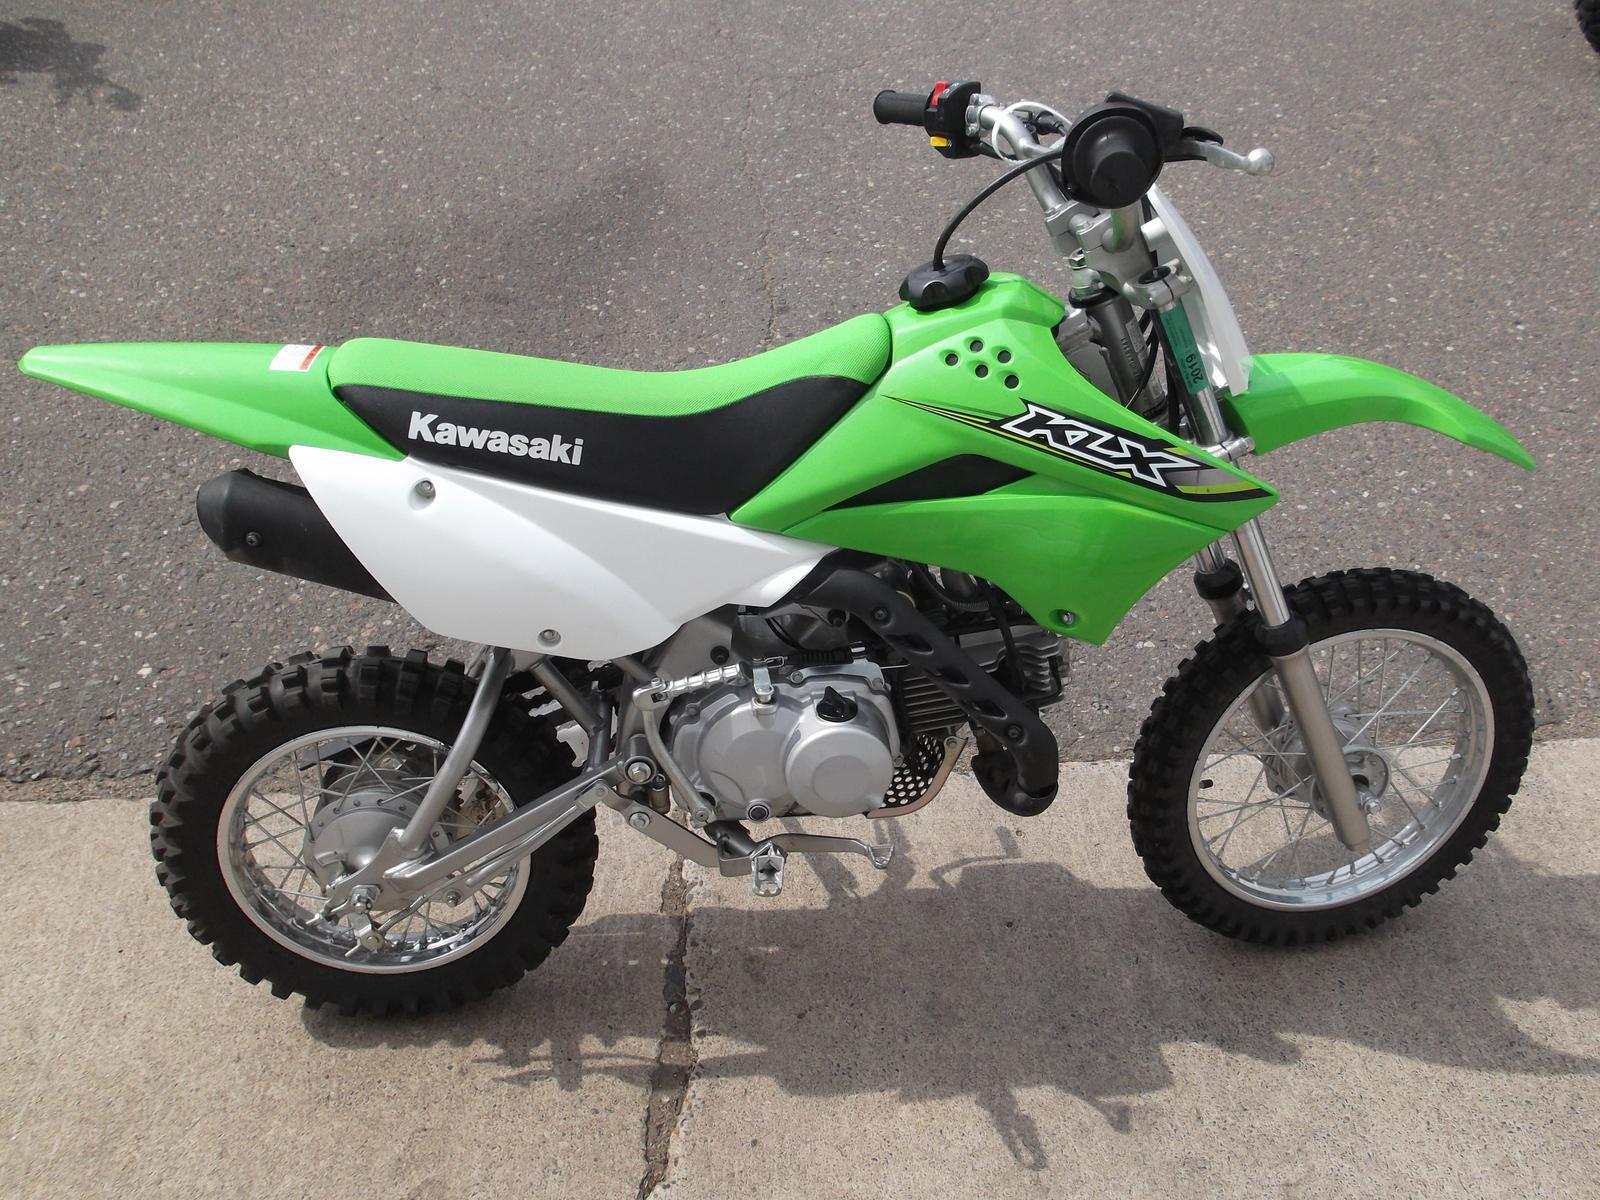 2017 Kawasaki KLX 110 for sale in Cambridge, MN | Larson's Cycle Inc